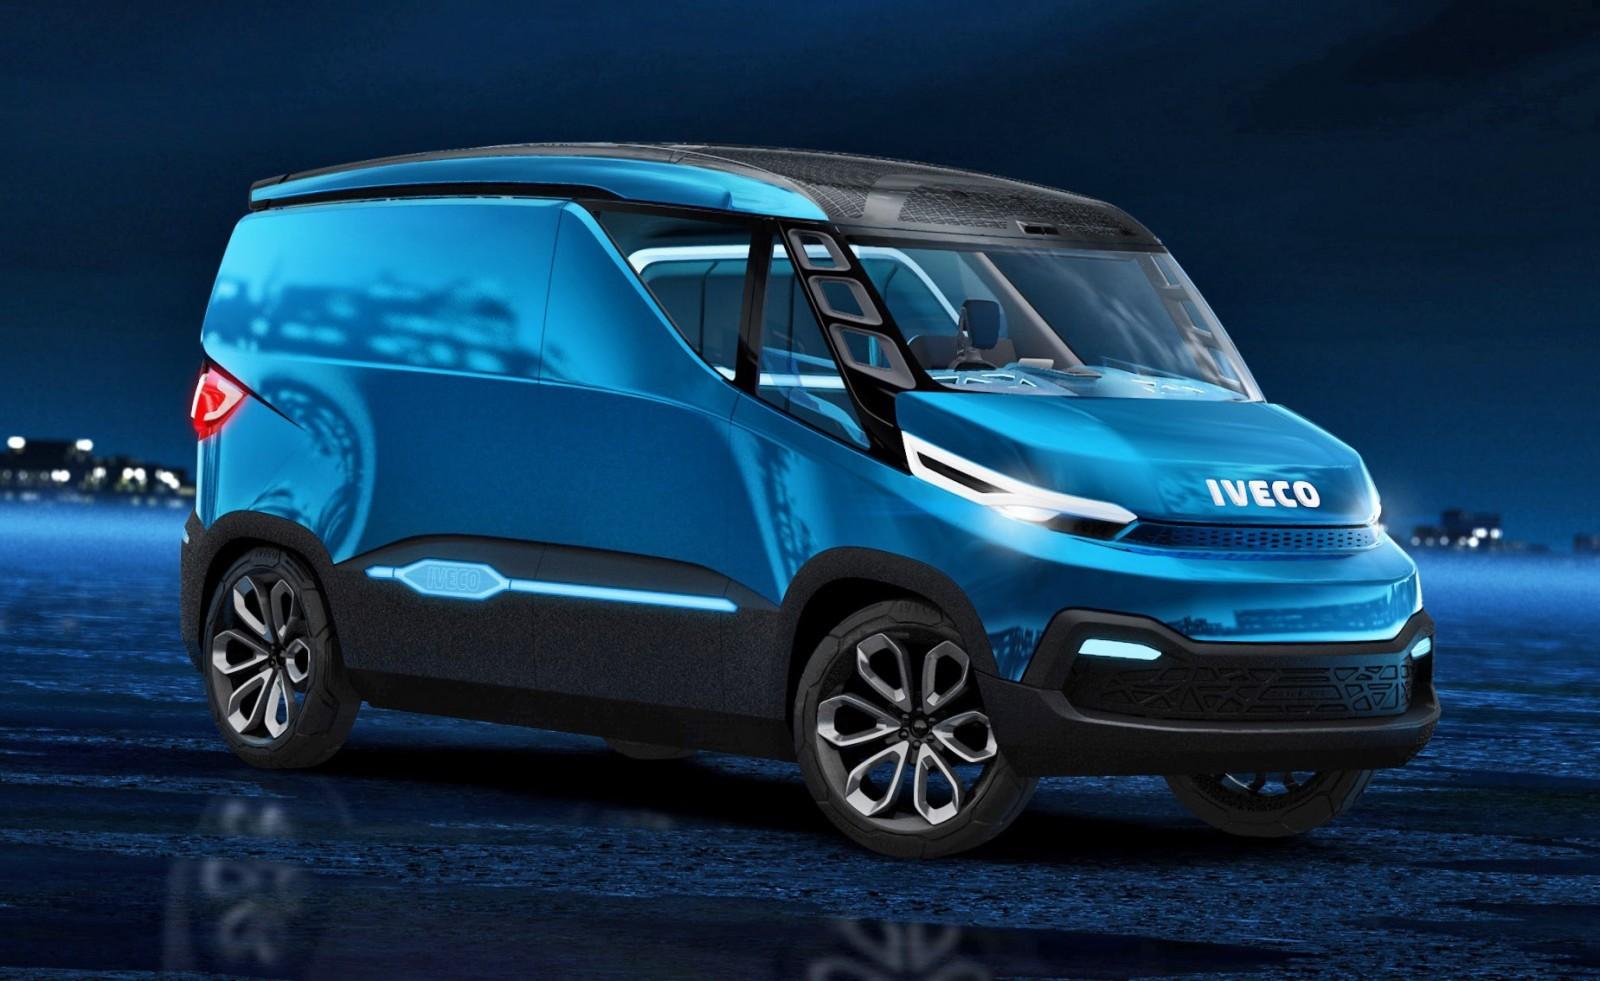 2015 IVECO Vision Concept Van 10